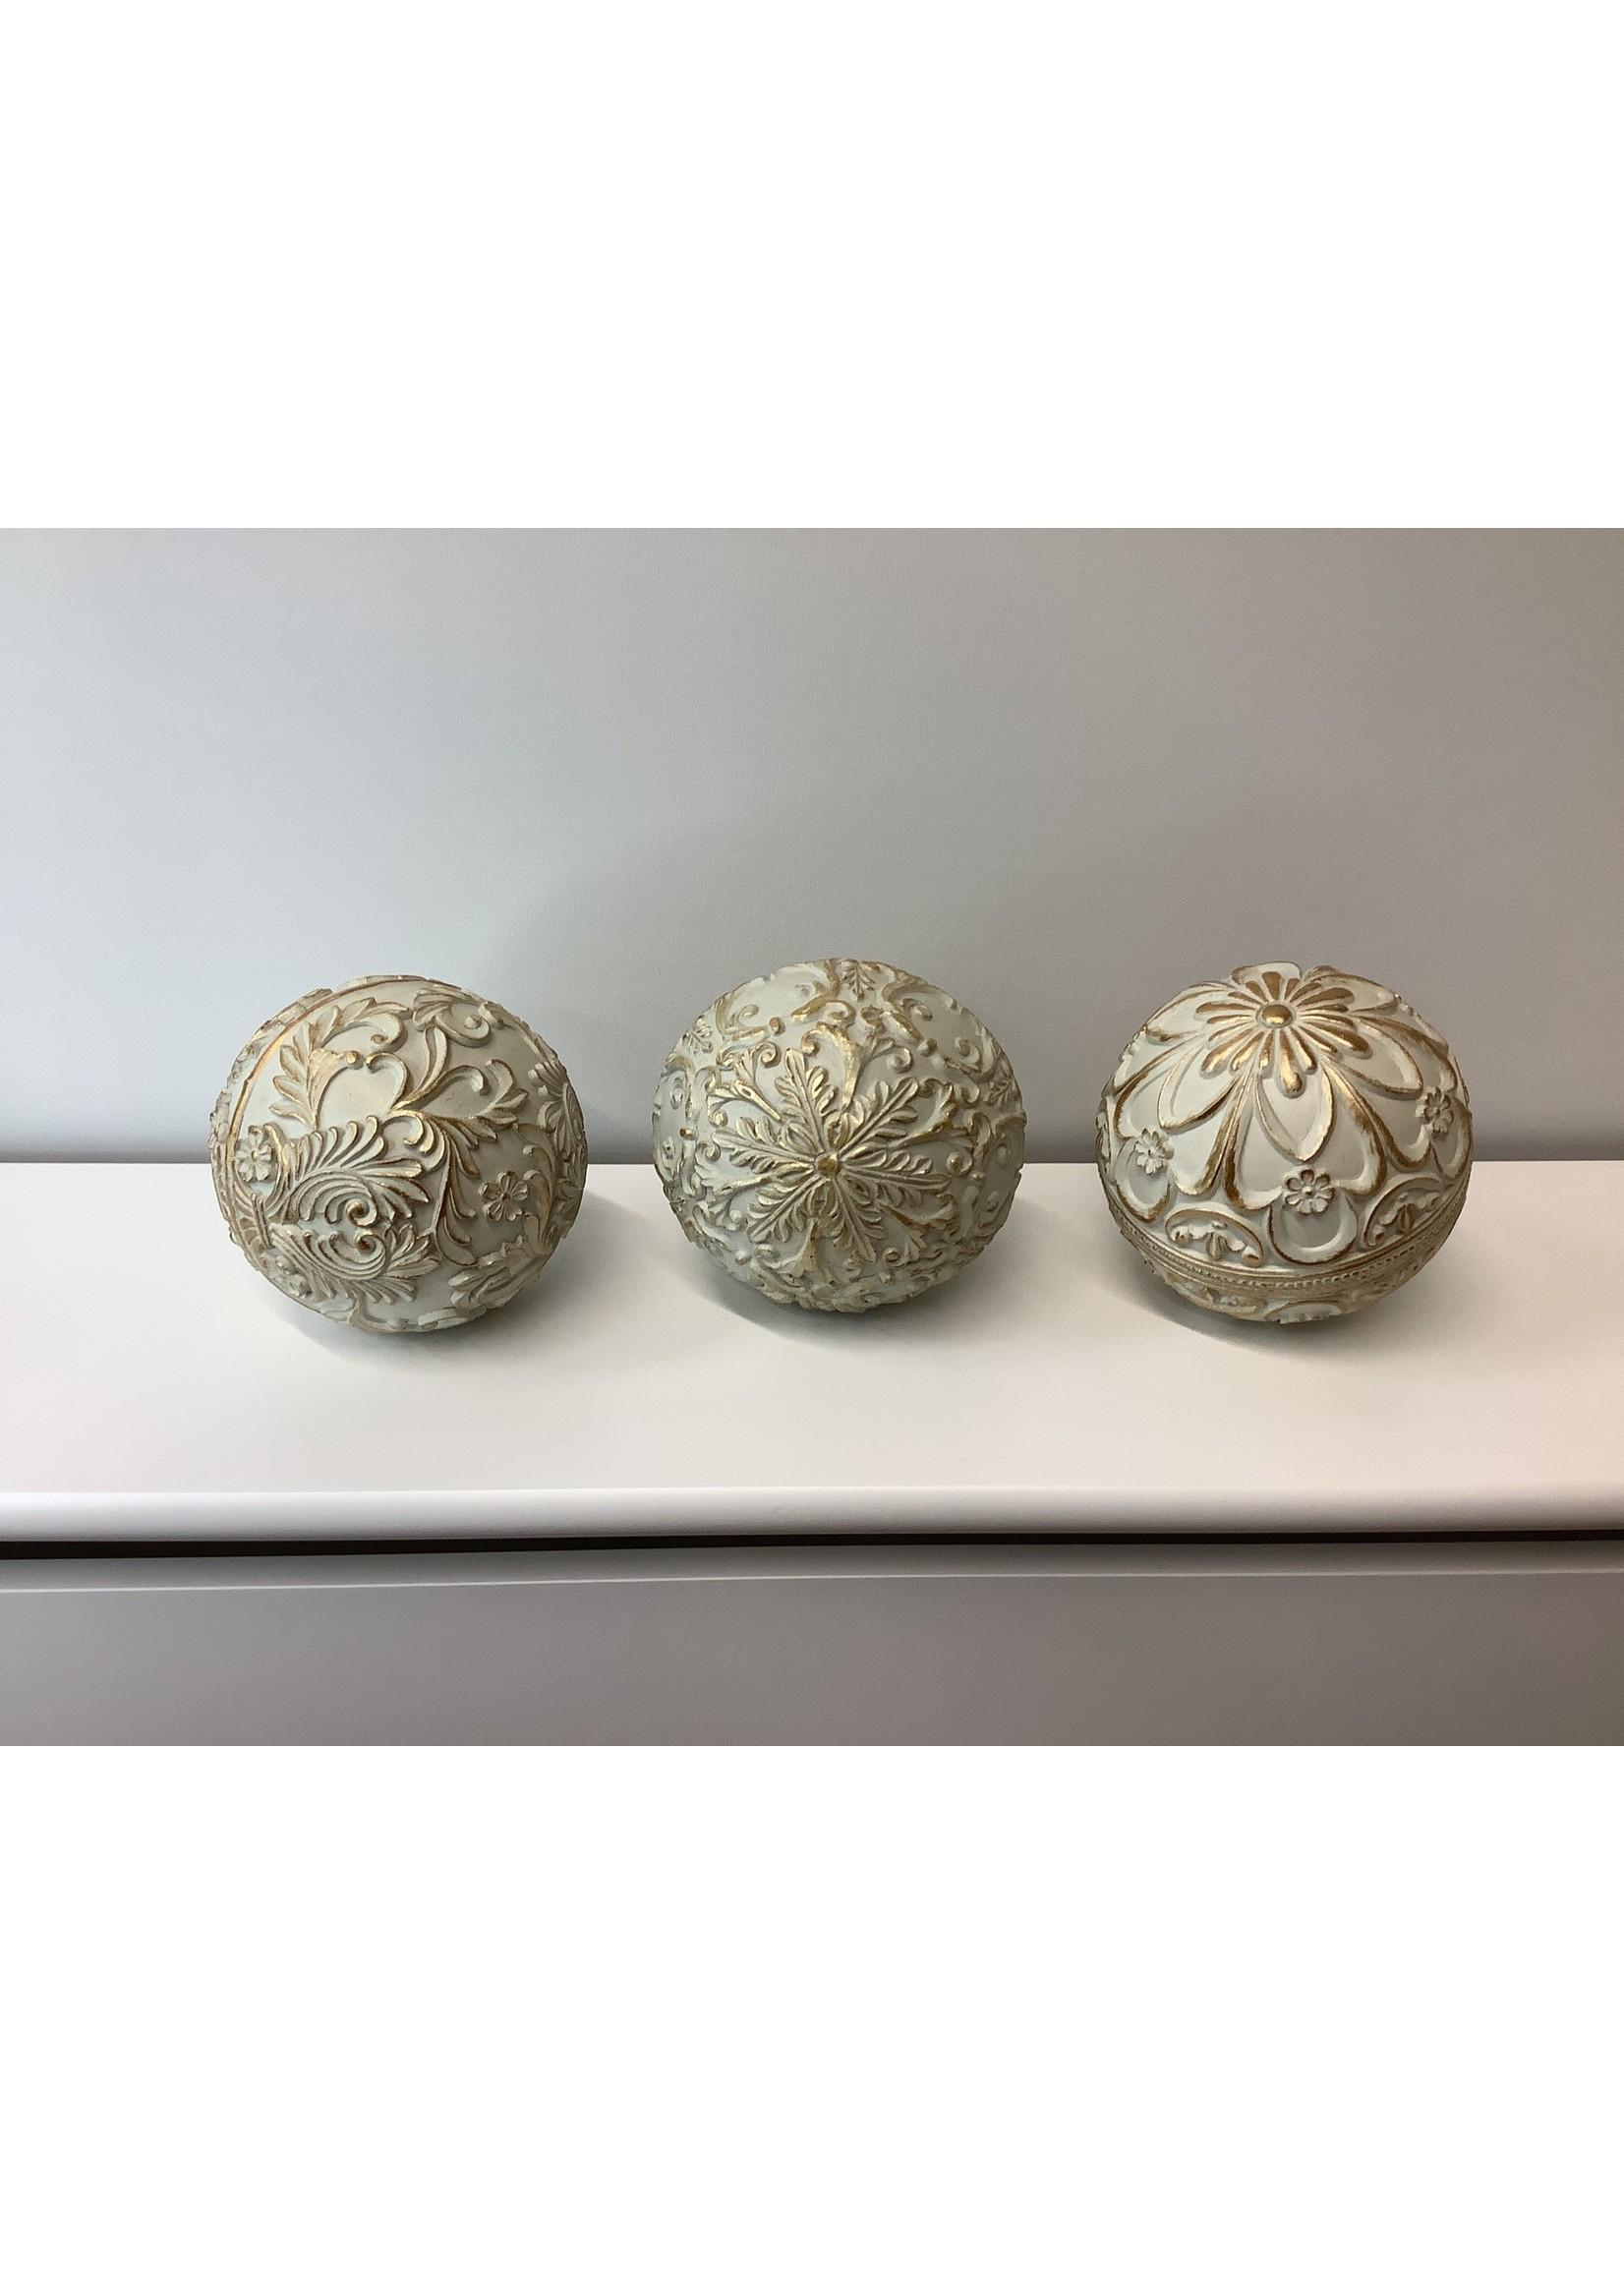 Set of three decorative balls